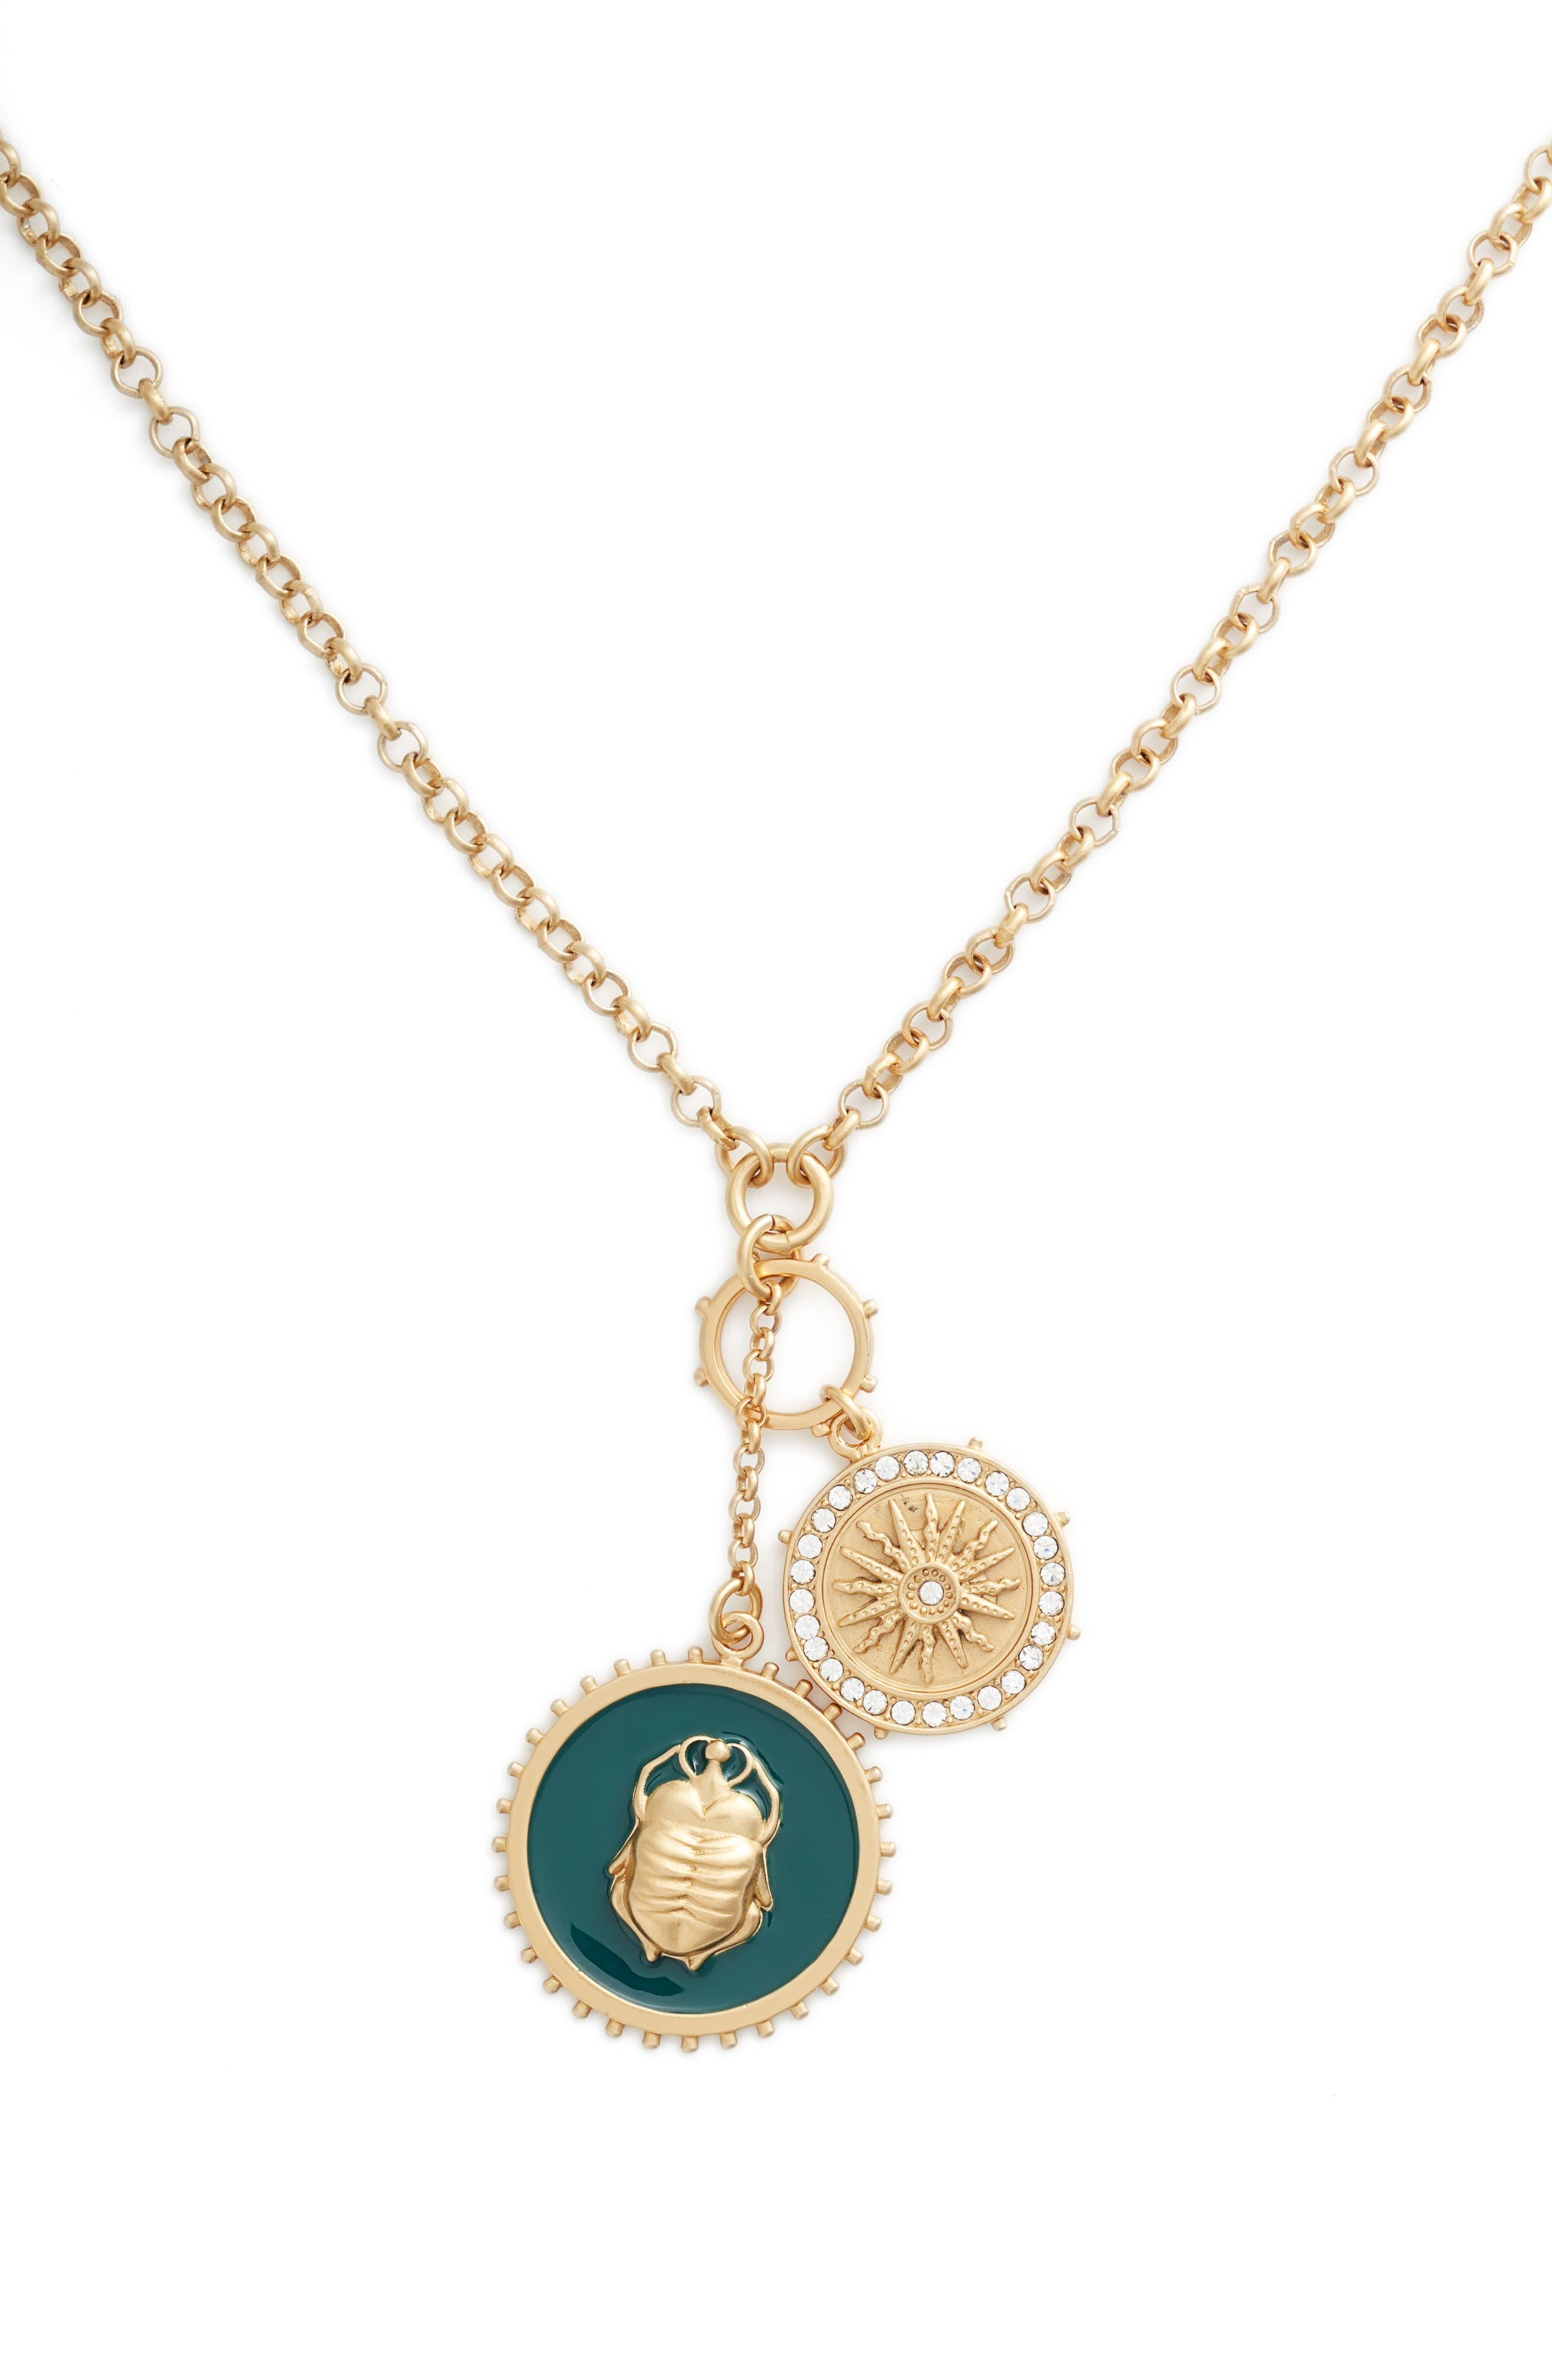 Enamel Scarab Pendant Necklace,                             Alternate thumbnail 2, color,                             710